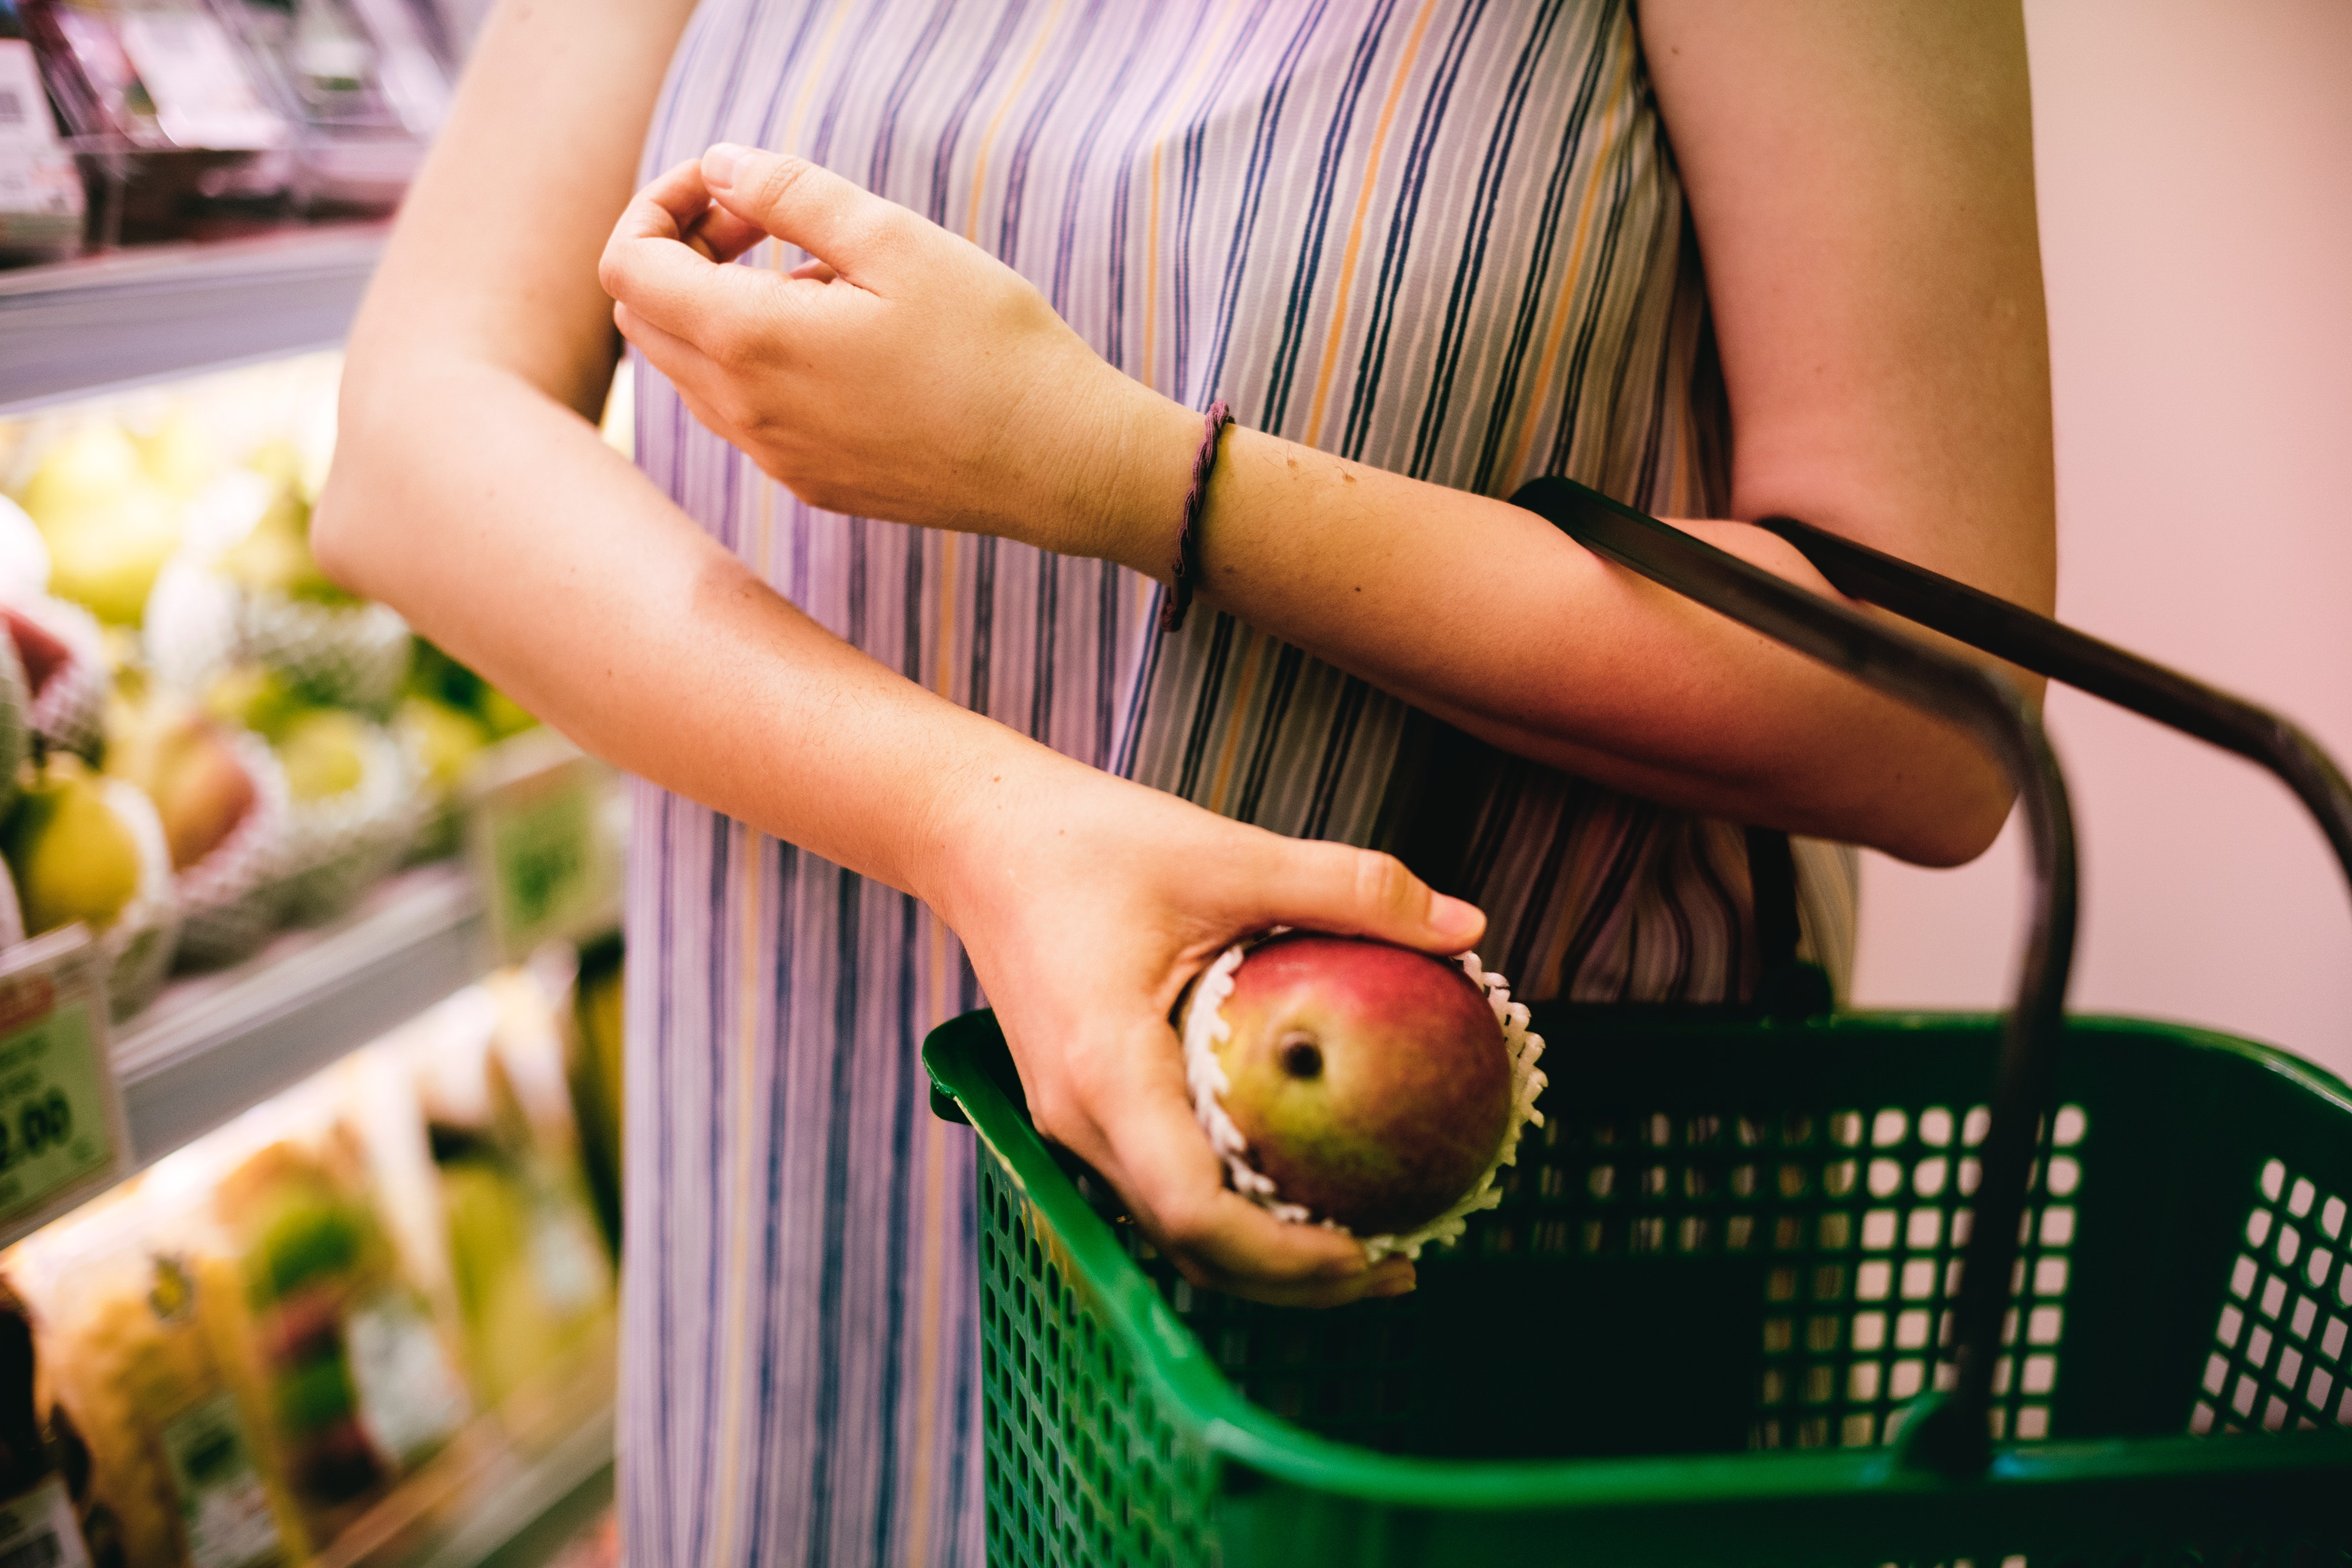 apple-basket-buy-1260305